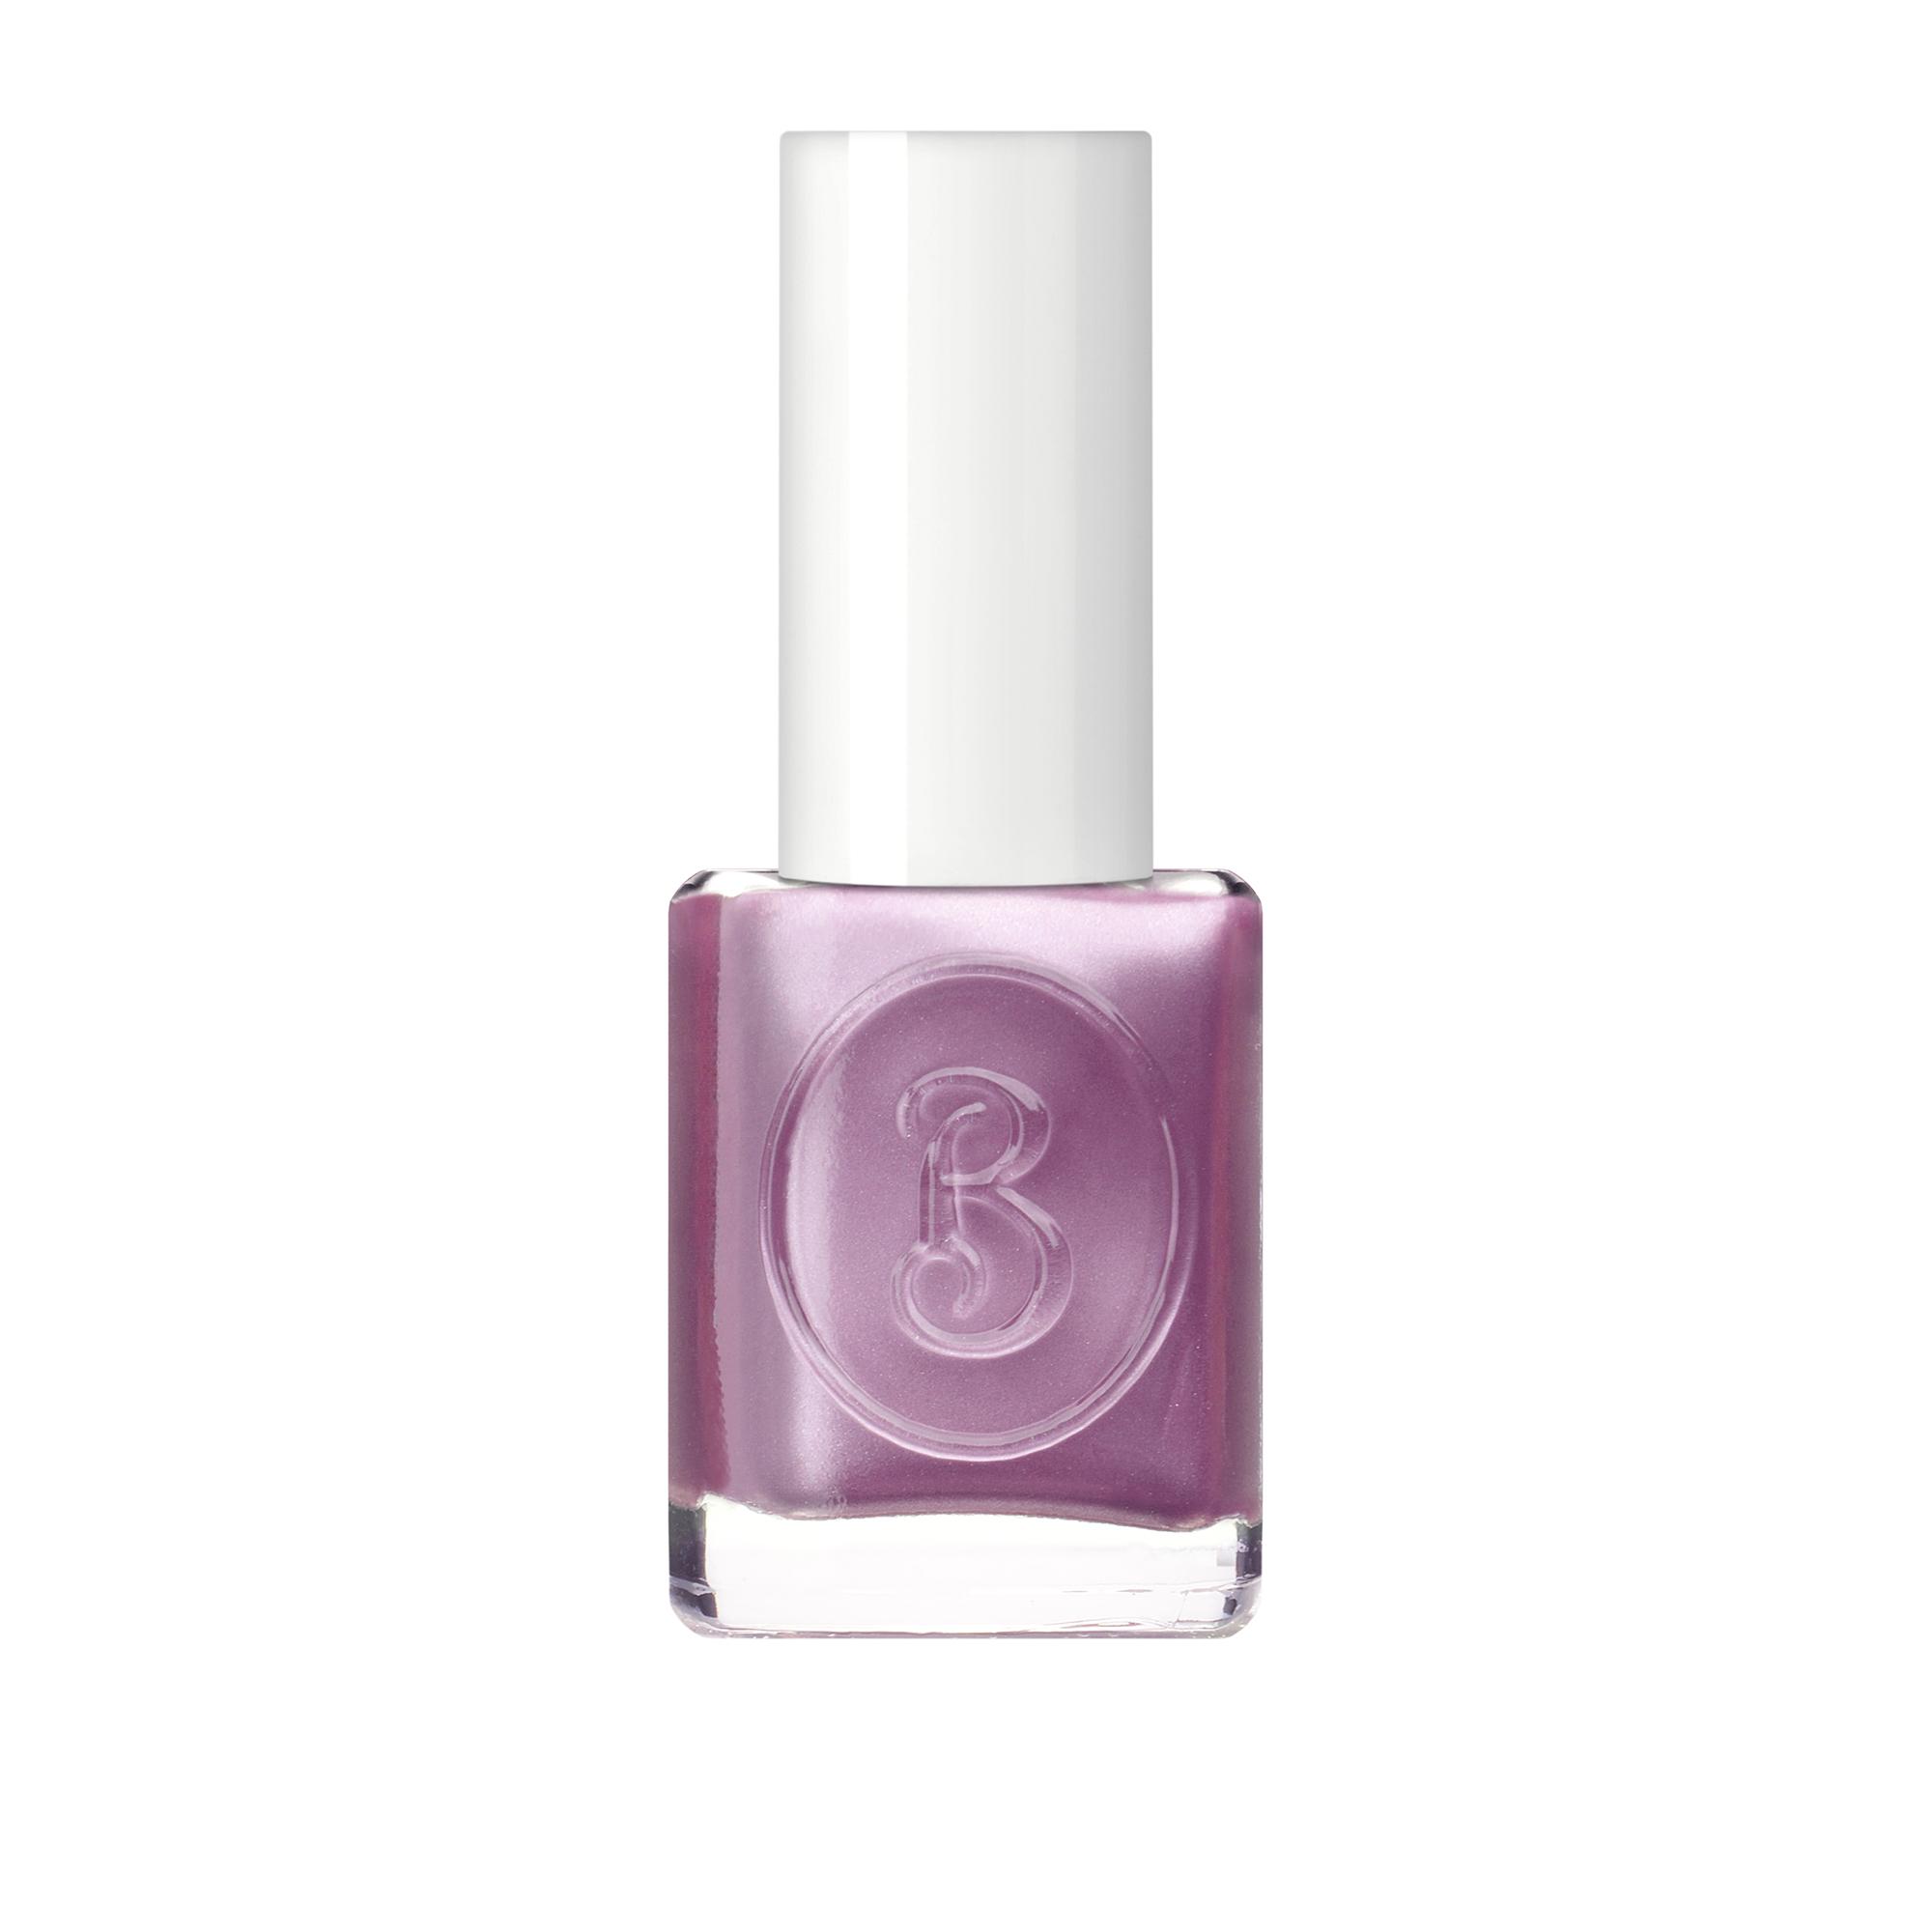 BERENICE Лак для ногтей розовый жемчуг тон 30 pink pearls / BERENICE 16 мл